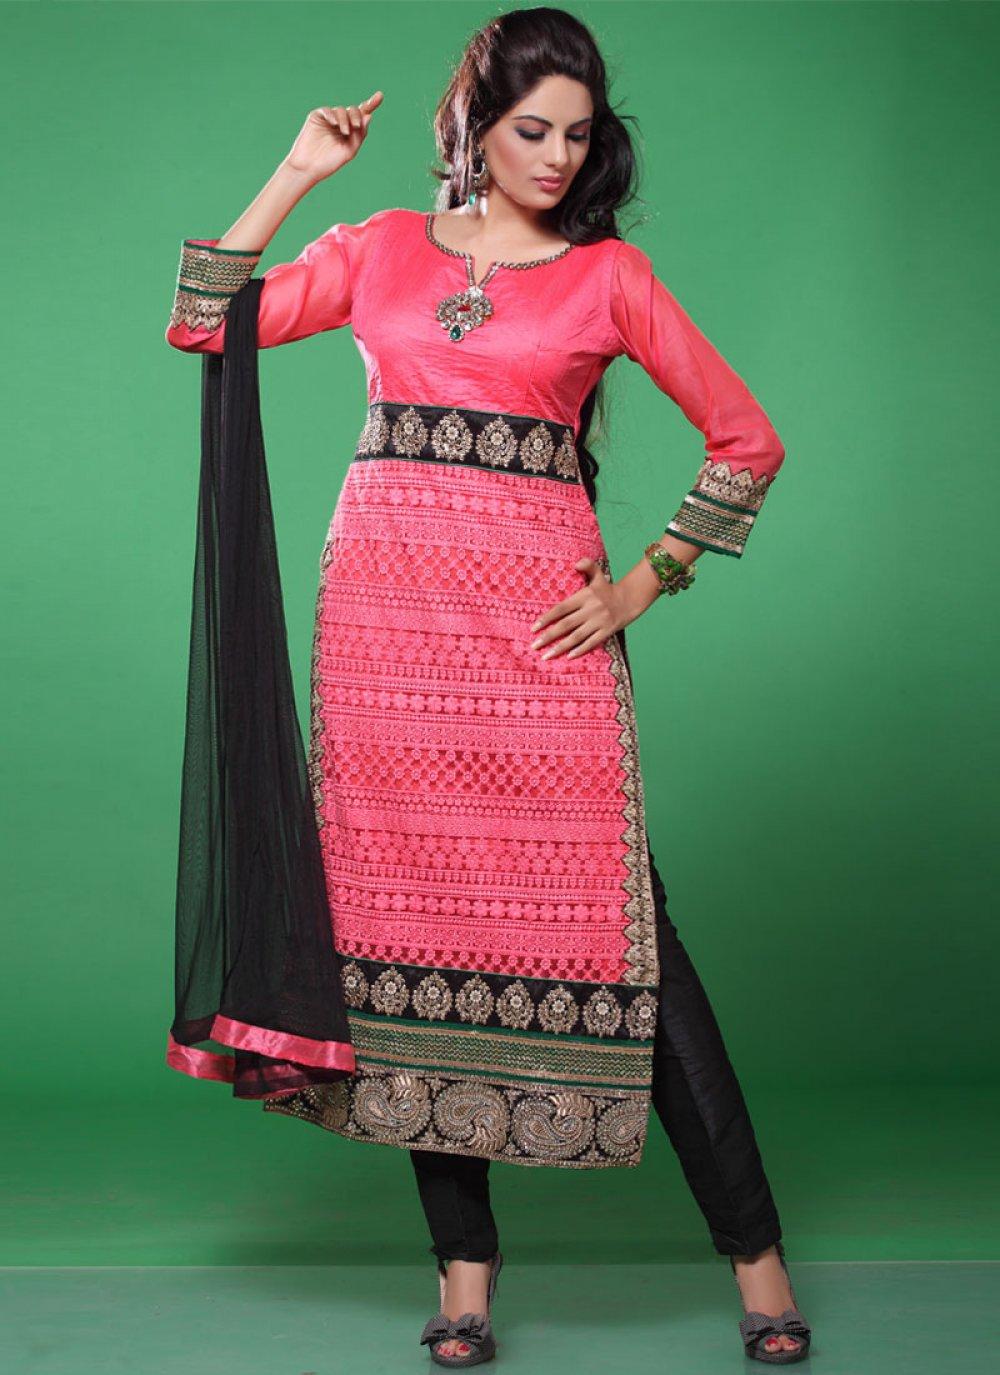 Hot Pink And Black Resham Work Faux Georgette Churidar Salwar Suit